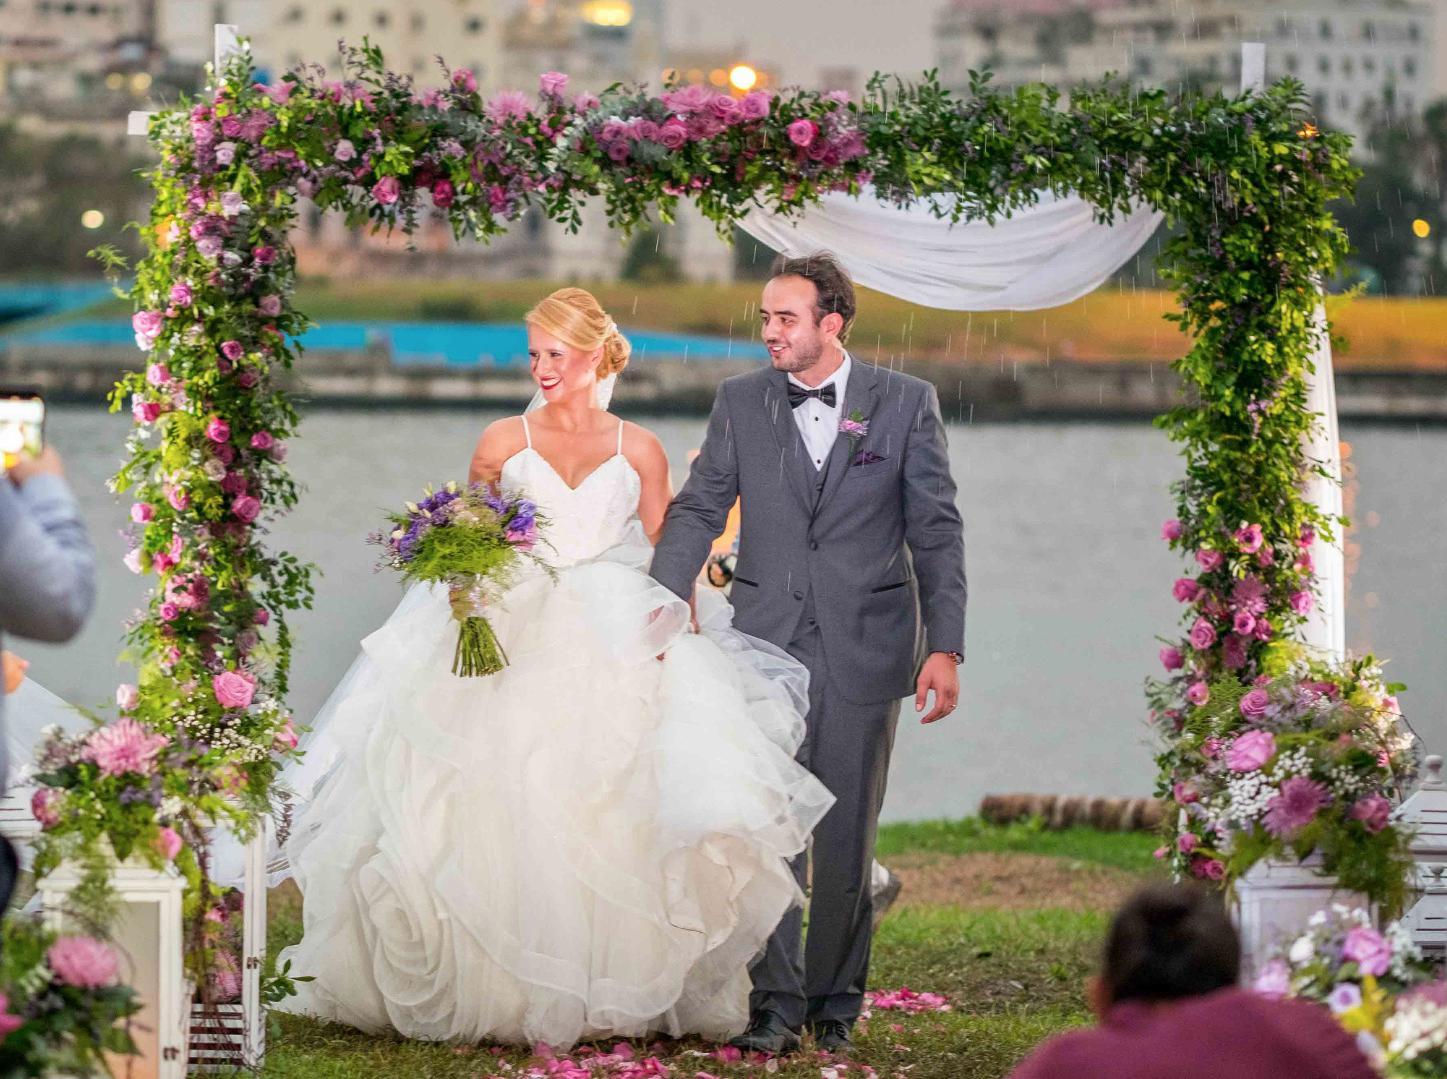 bodas-sin-clasificar-sin-tema-cuba-36301.jpg